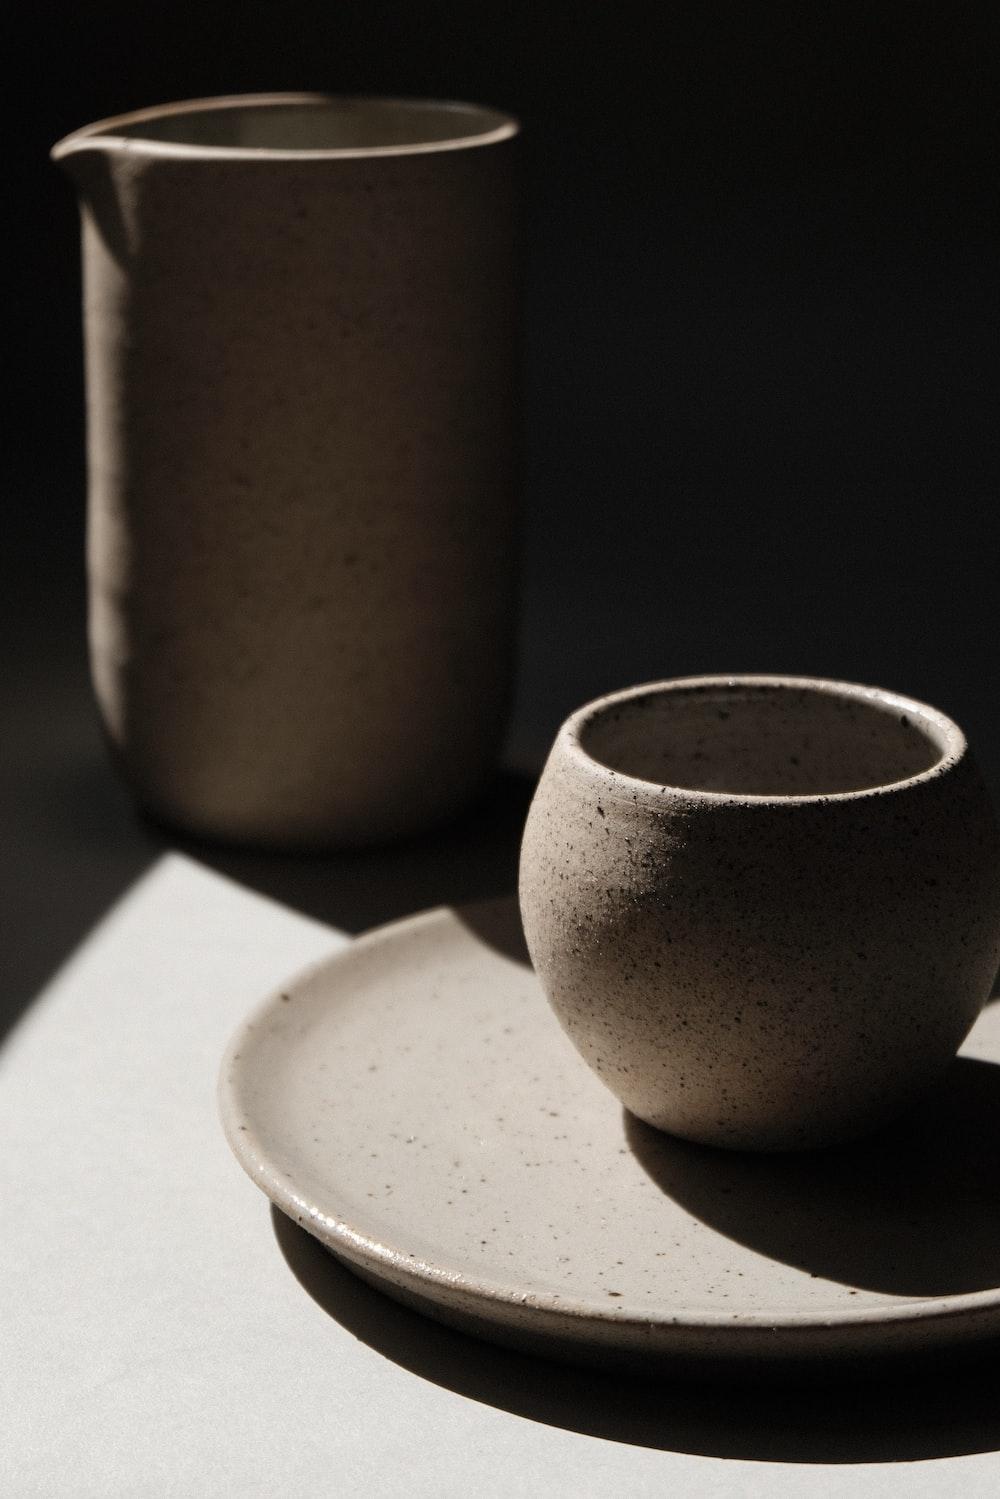 brown ceramic cup on white ceramic saucer